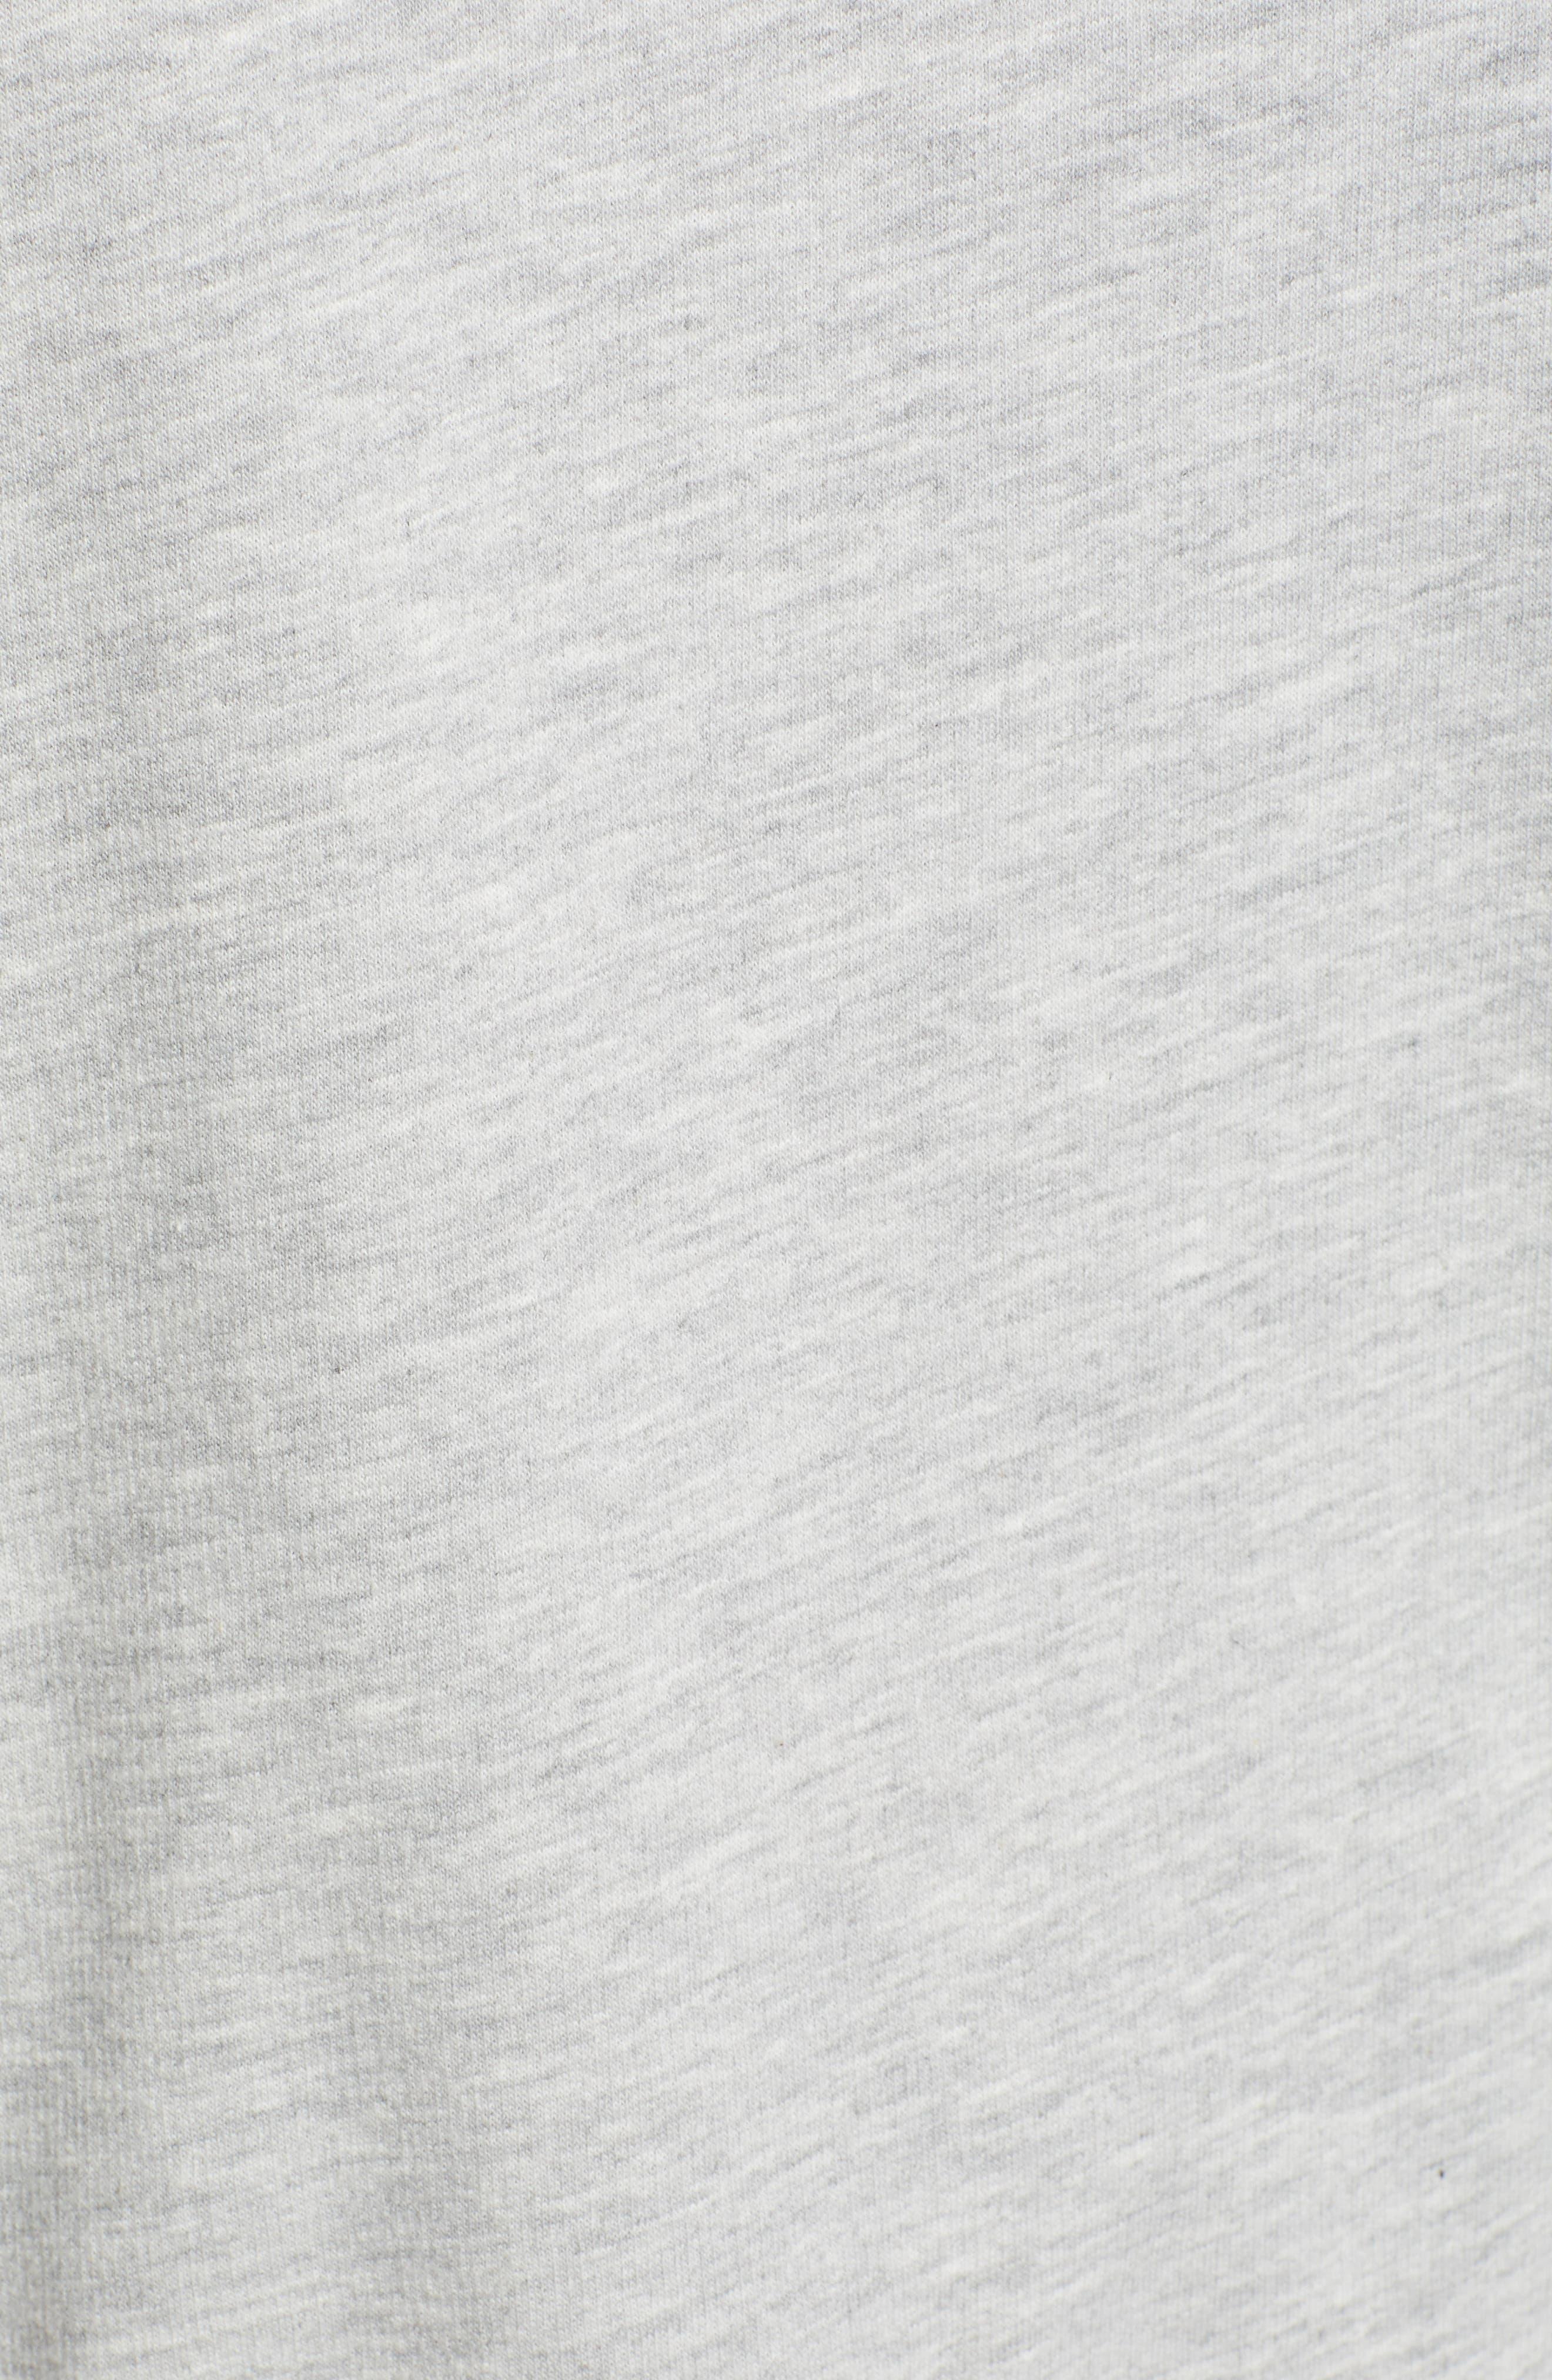 Raglan Sweatshirt,                             Alternate thumbnail 5, color,                             GREY HEATHER- NAVY COMBO